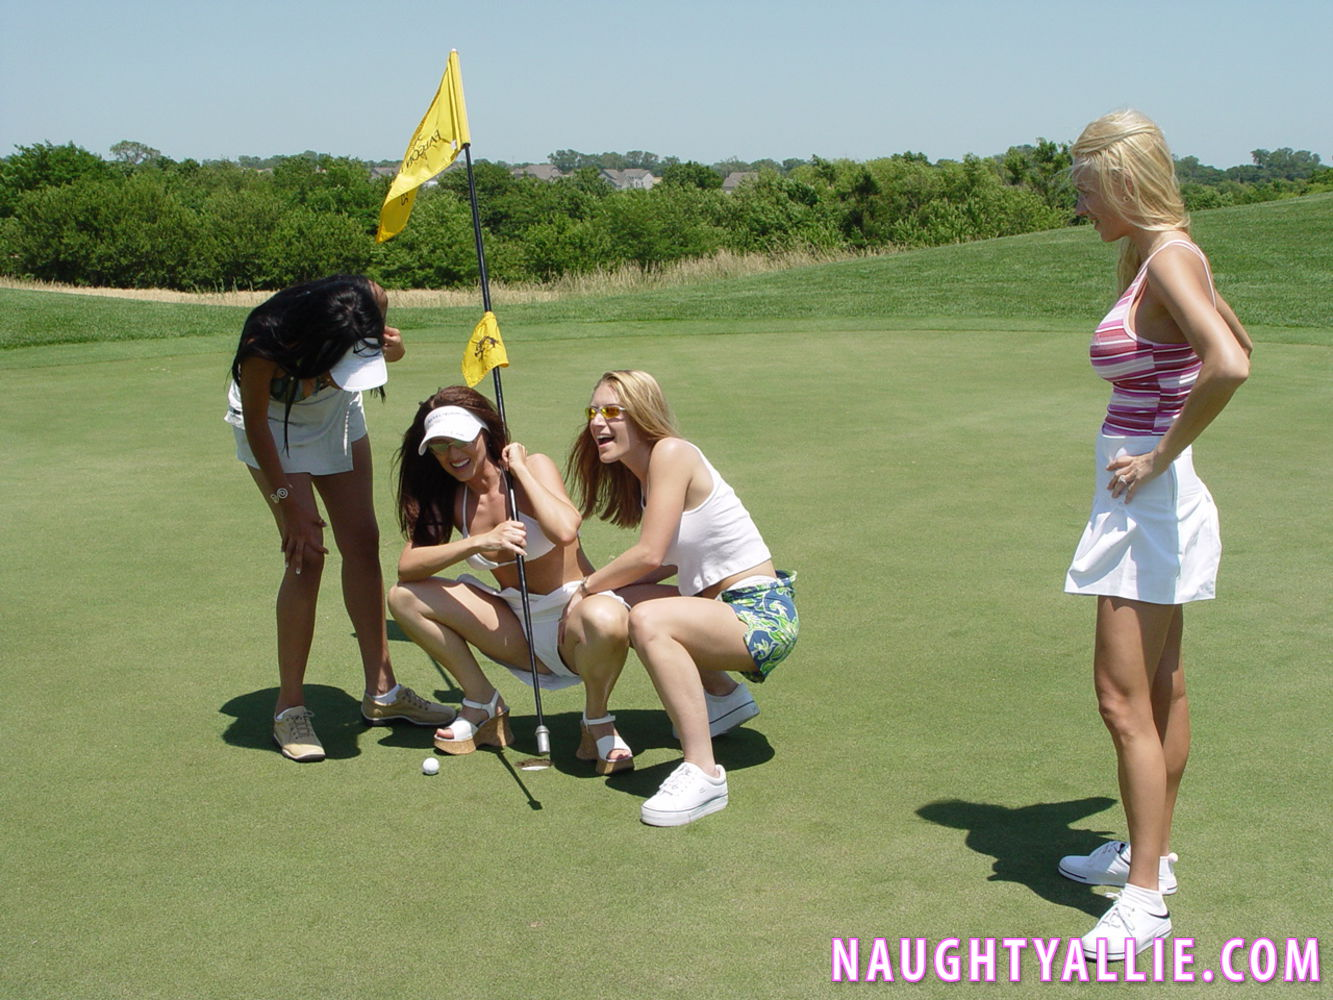 Regret, but Golf caddy sluts pity, that